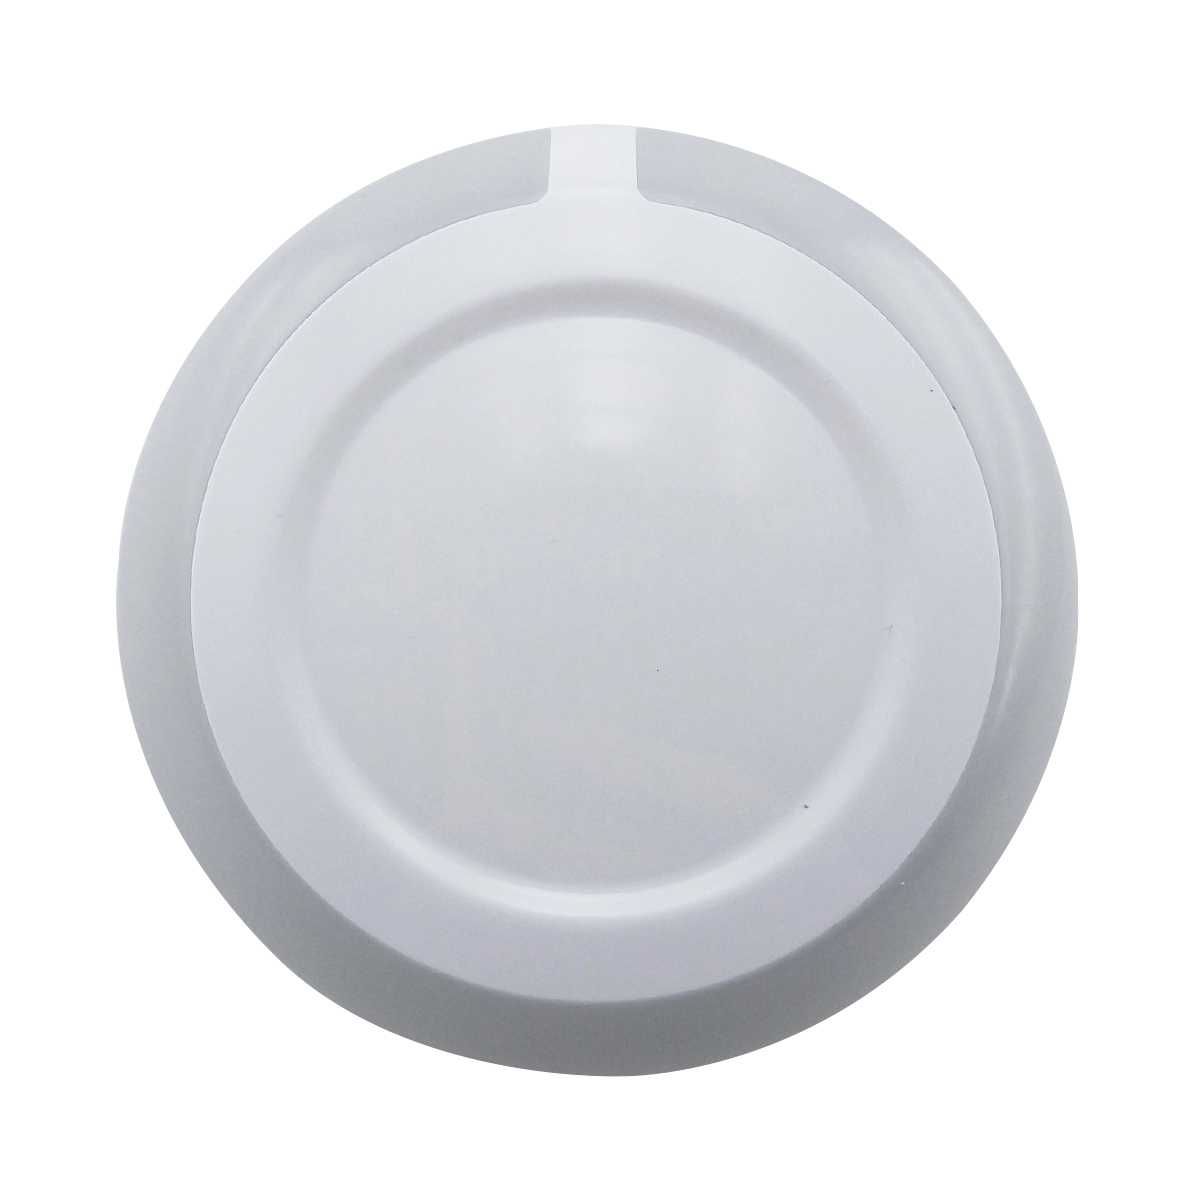 Botão seletor de programação da lavadora Eelectrolux LTC10, LT11F, LT12F, LTC15, LT15F, LA15F, LTP15, LP12Q, LT12Q, LTC12, LB12Q, LBT12, LTP12, LTM15, LM13Q